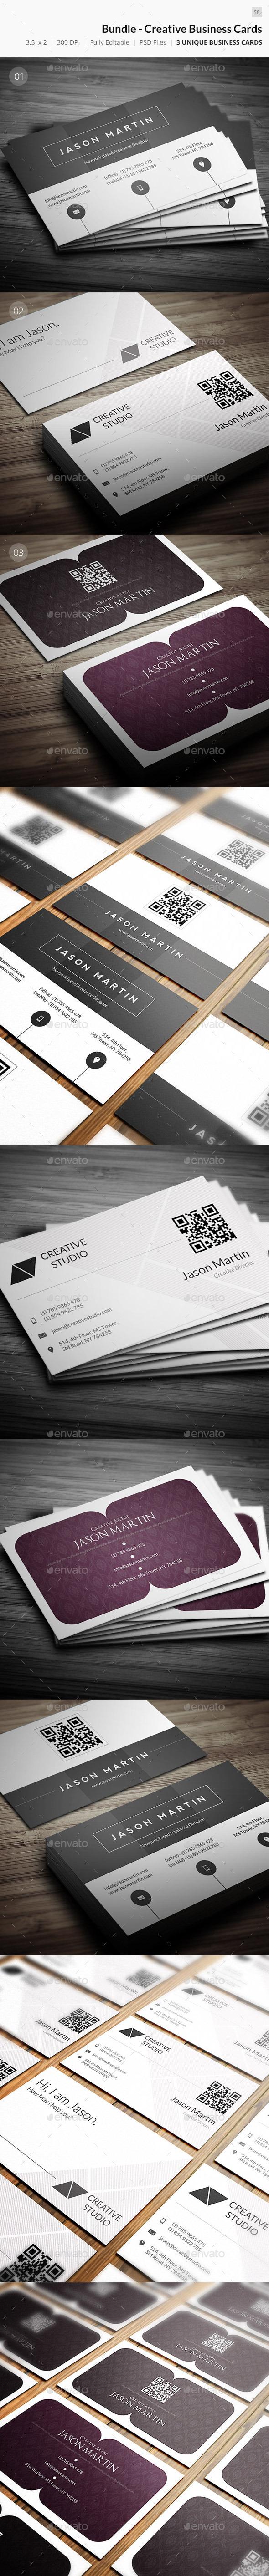 Bundle - Creative Business Cards - 58 - Creative Business Cards